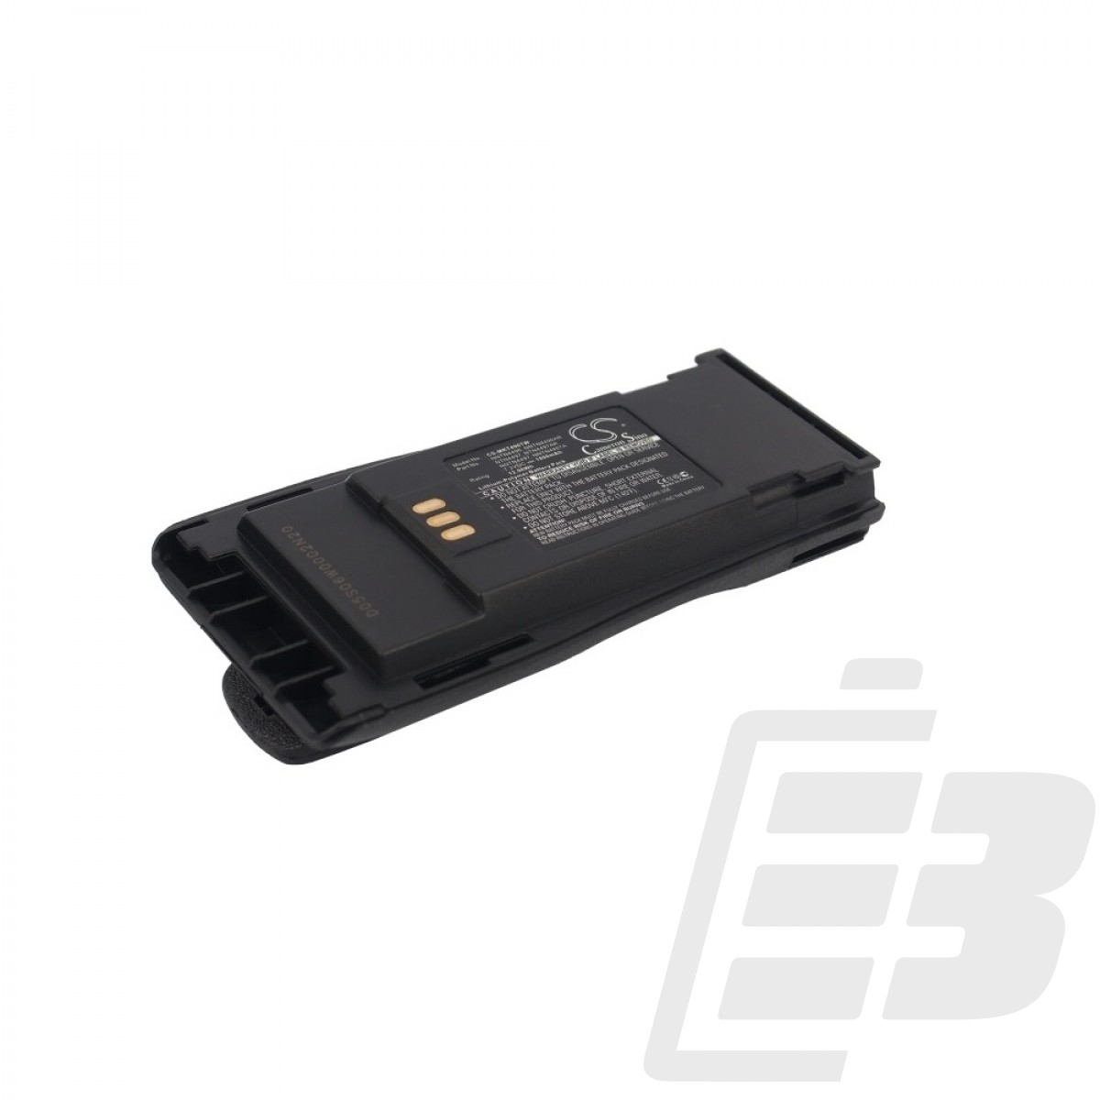 Two-Way radio battery Motorola CP040_1